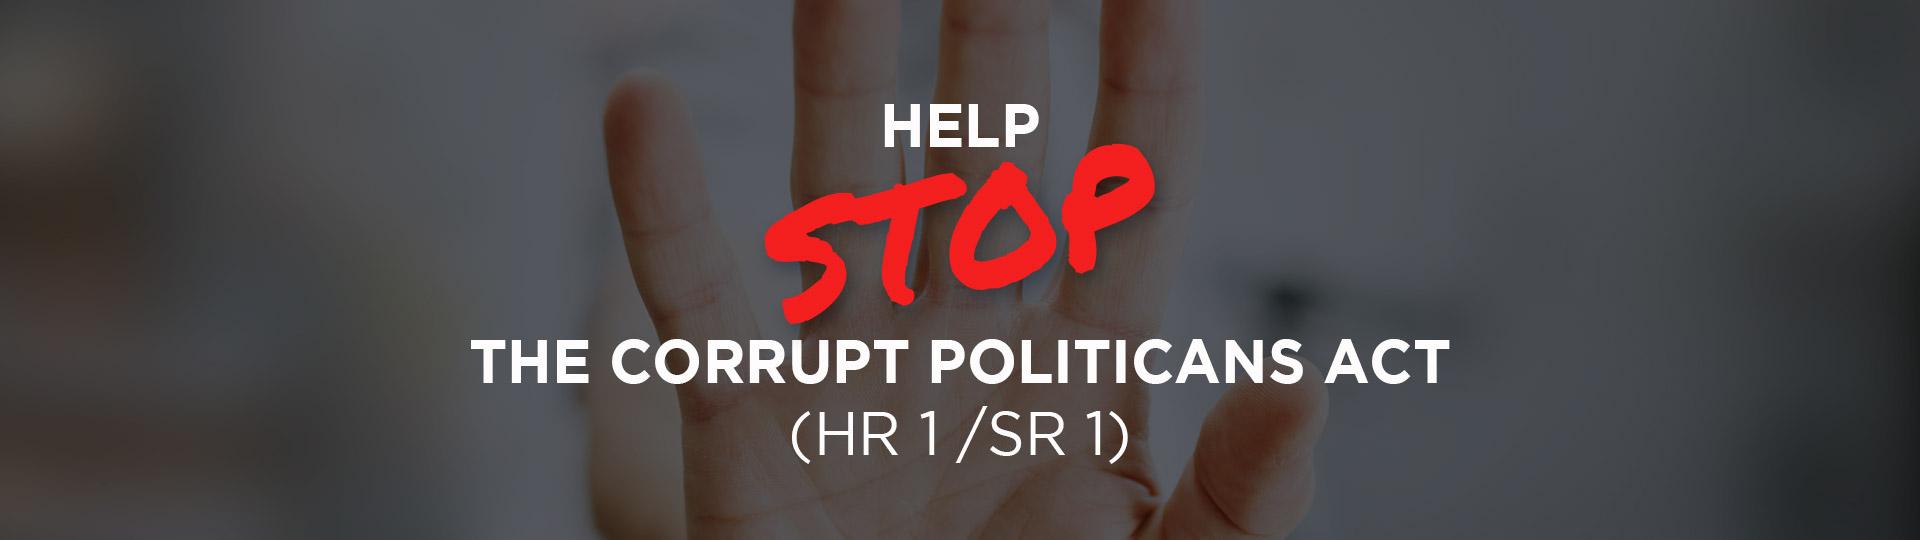 Stop the Corrupt Politicians Act